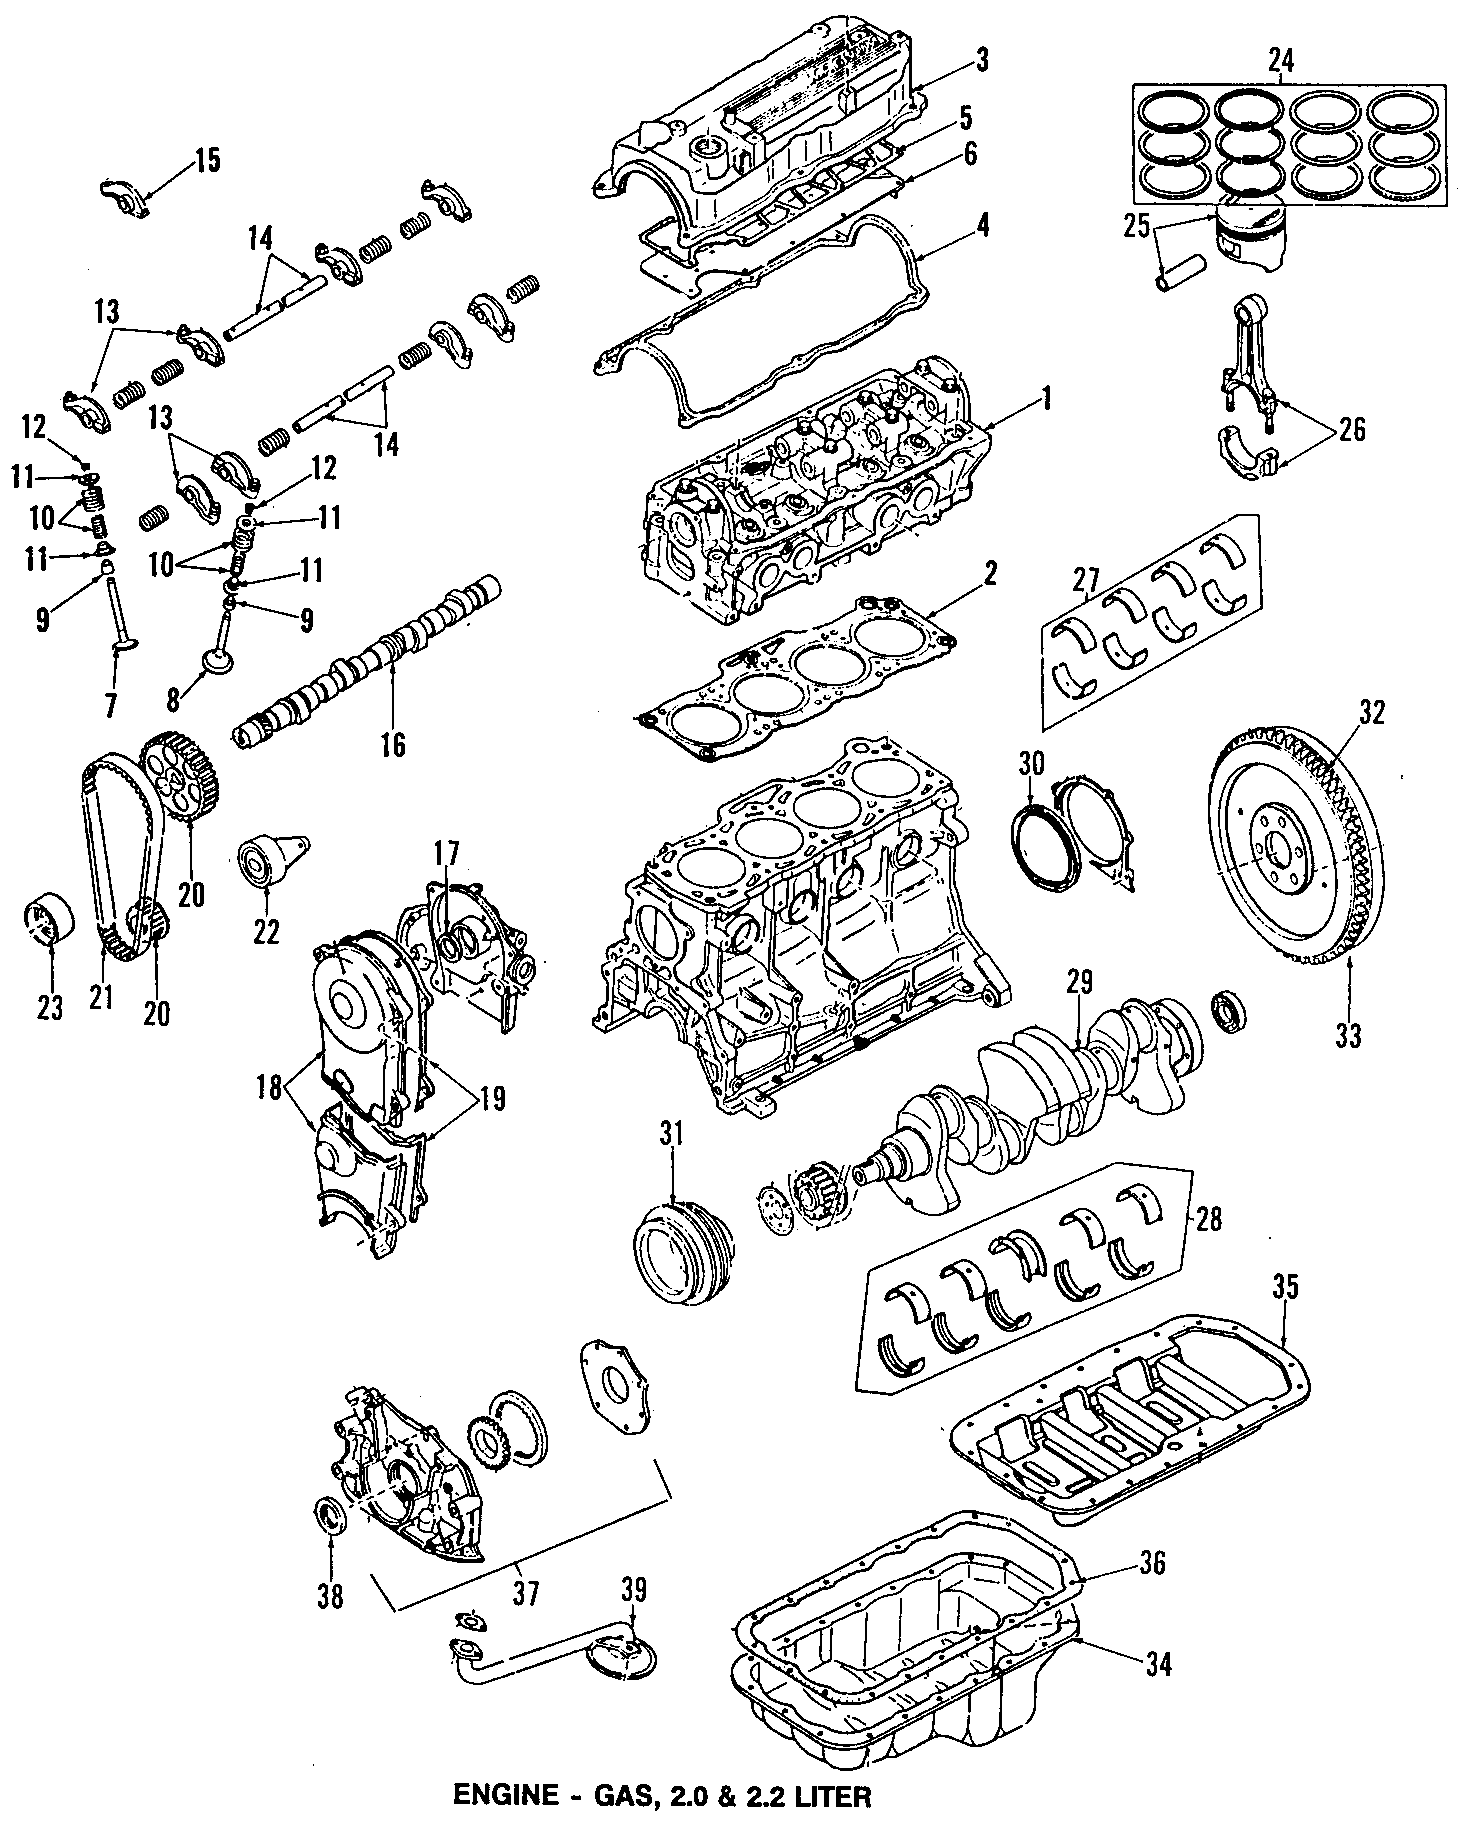 1989 Mazda B2200 Engine Timing Crankshaft Sprocket. 626